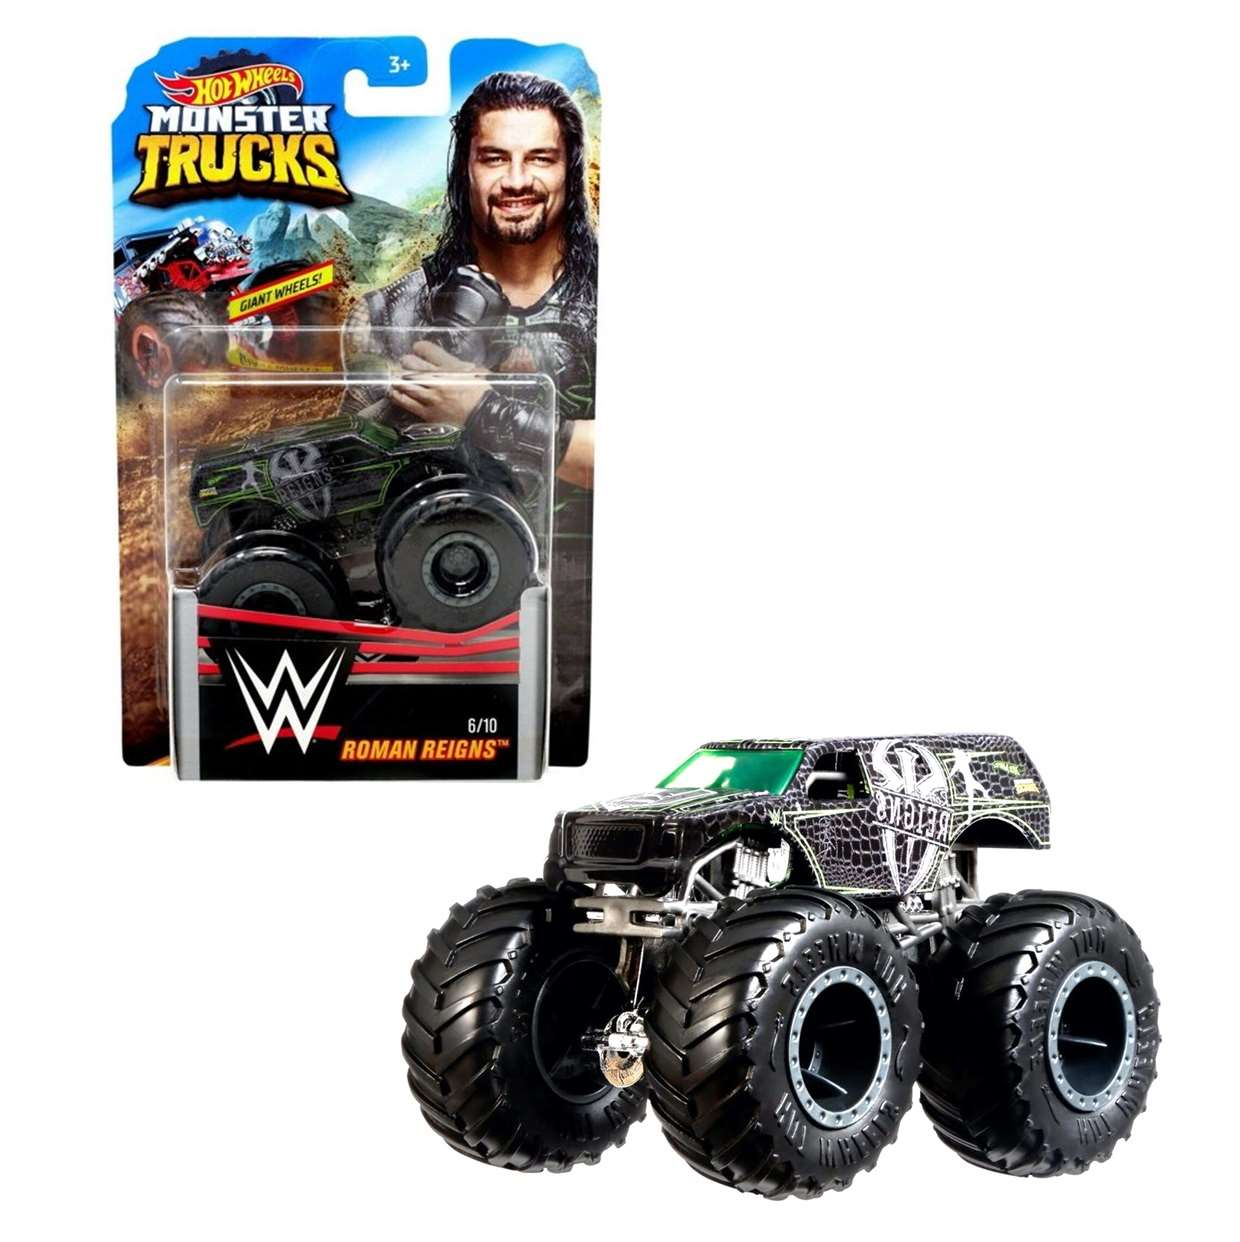 Roman Reigns Monster Trucks 6/10 Giant Wwe Hot Wheels